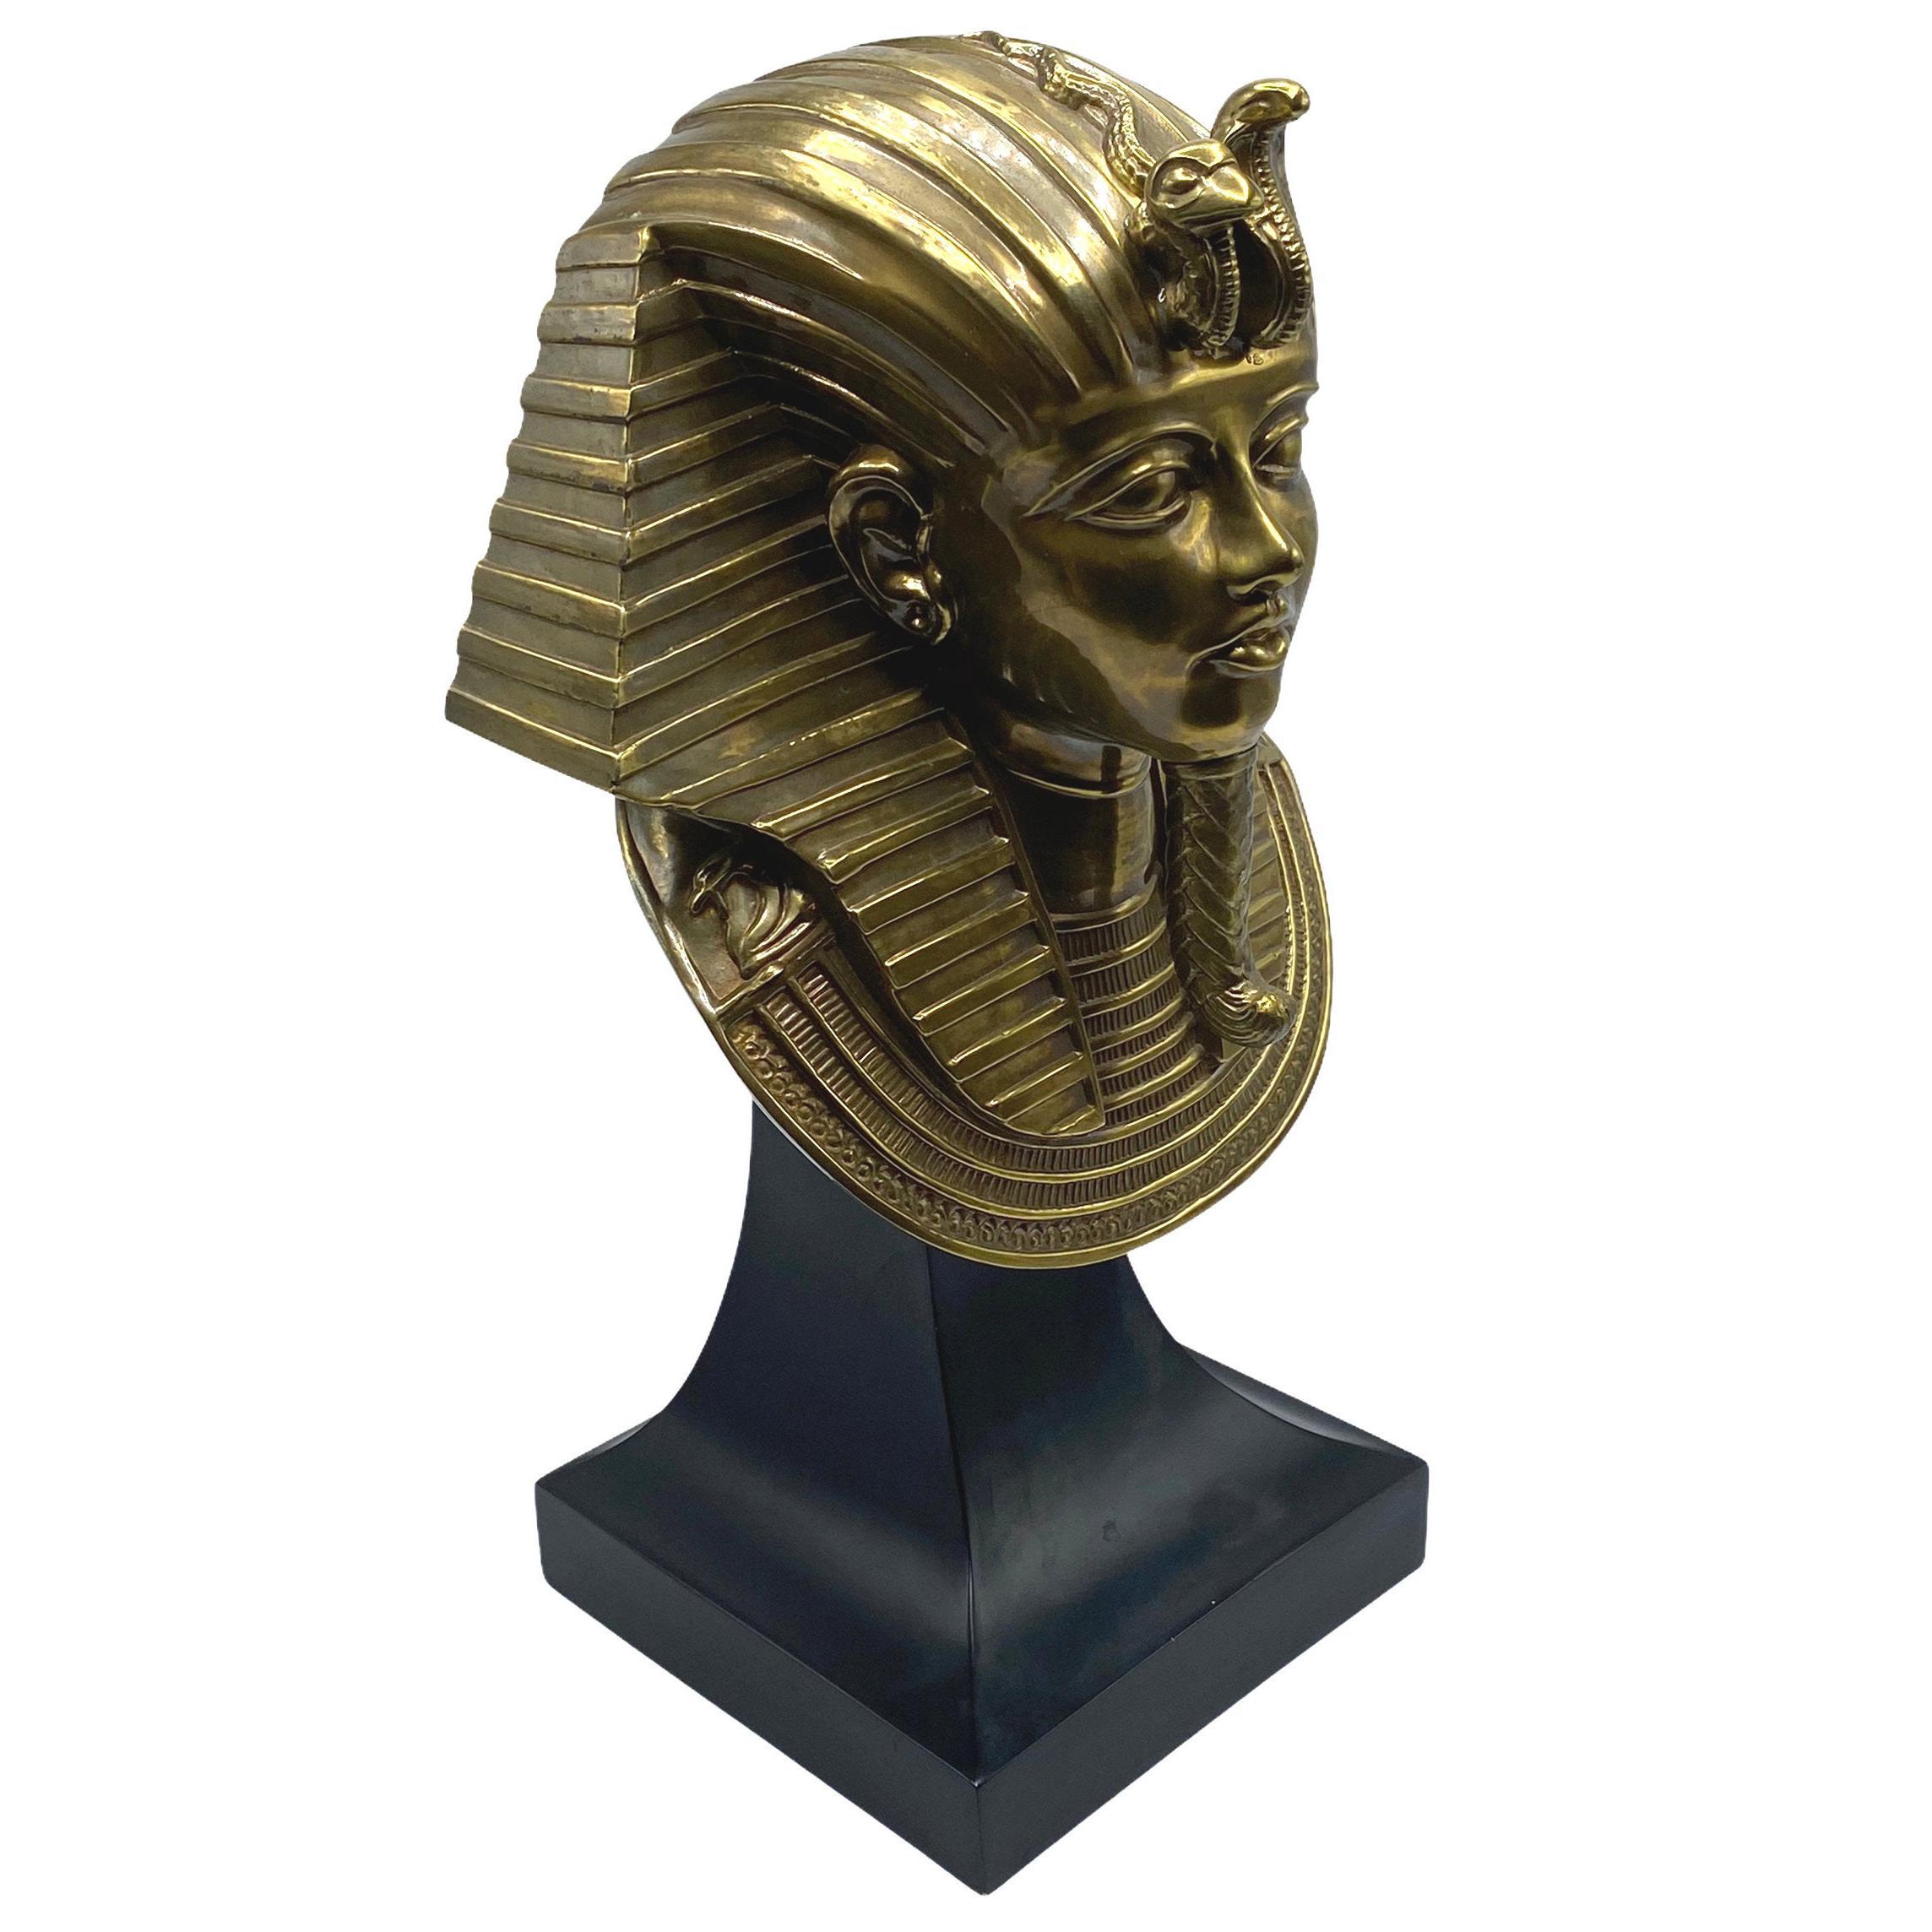 Egyptian Revival King Tut Bronze Bust Sculpture